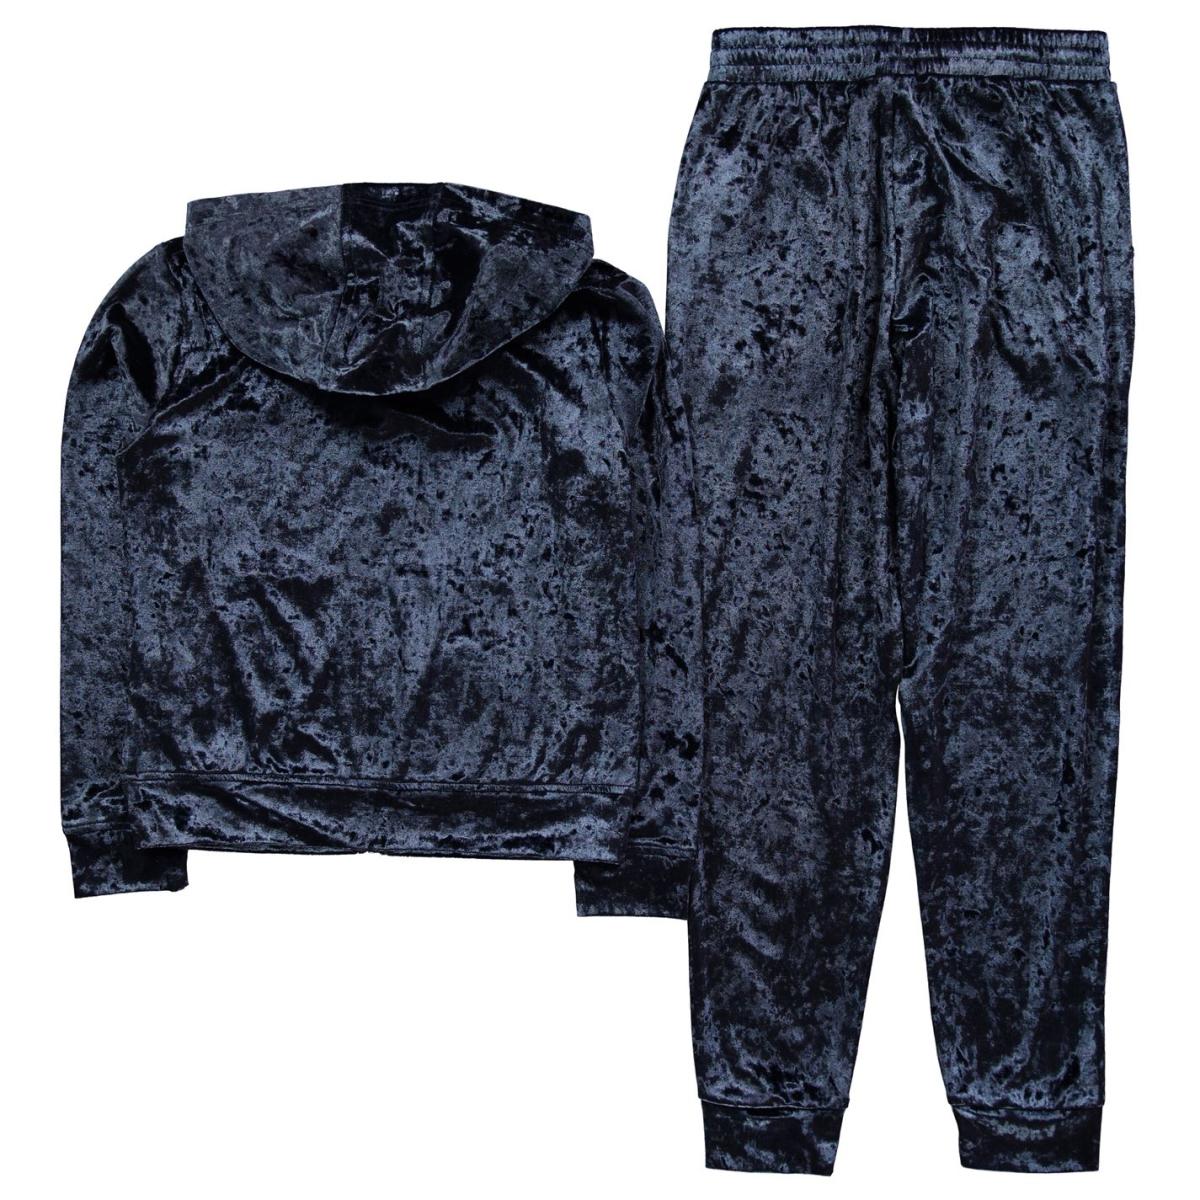 LA Gear Trainingsanzug Sportanzug Kinder Mädchen Velour 0120